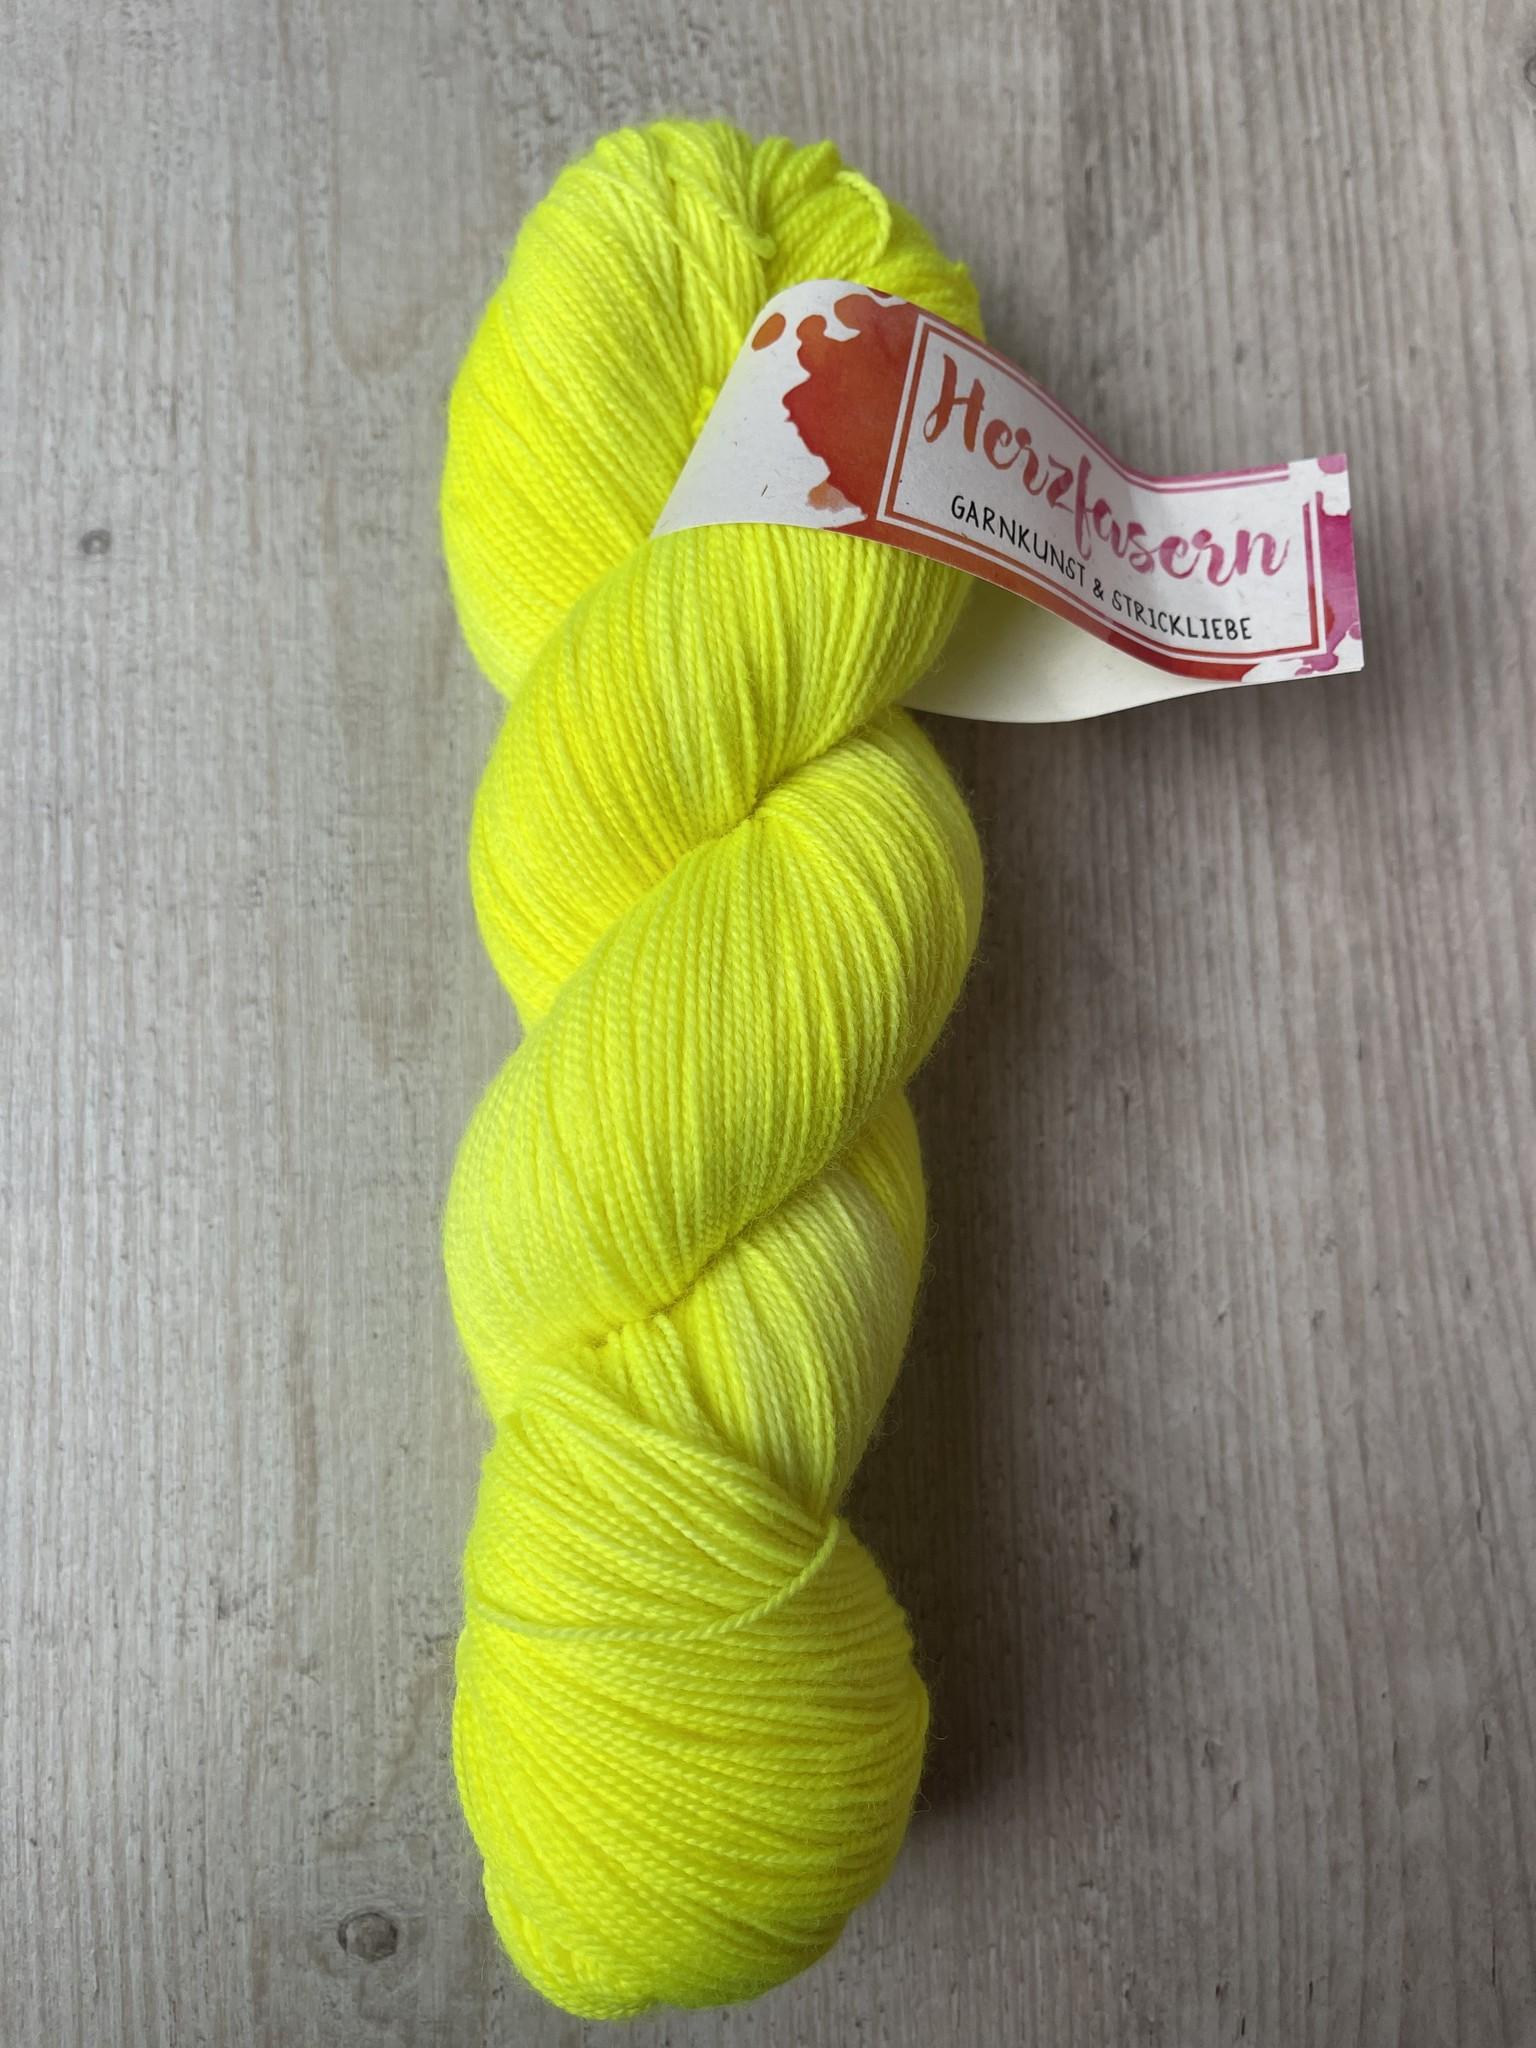 Herzfasern Lace Merino 600 -Neon Impressionen Lime